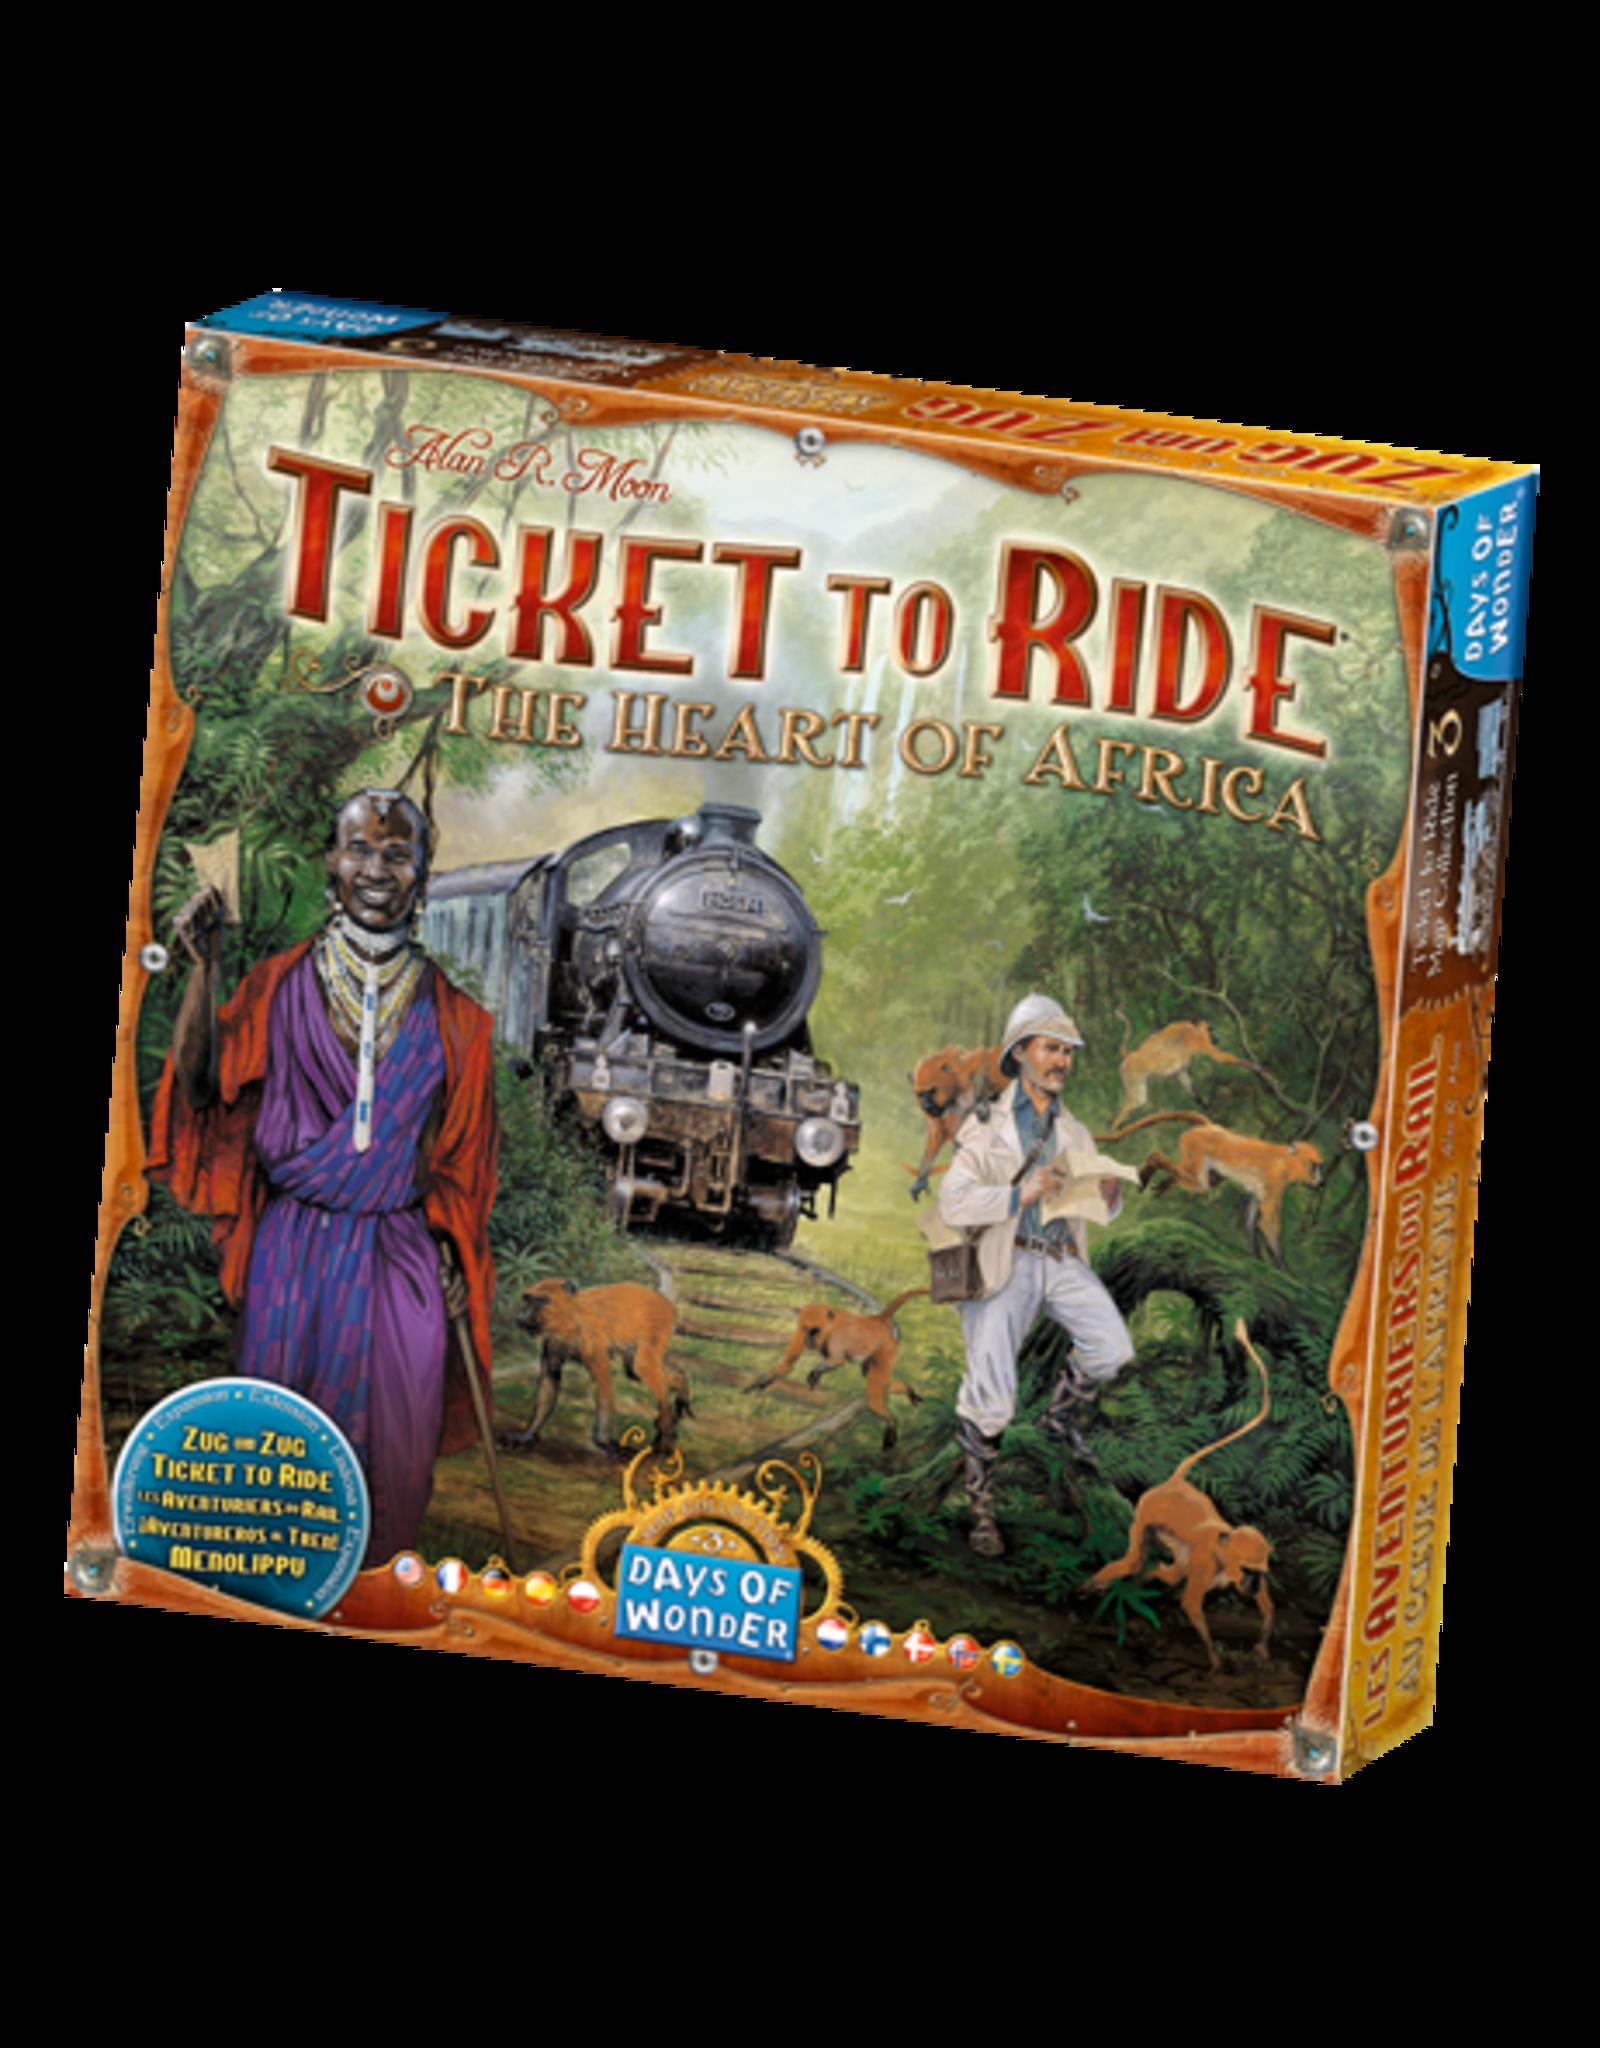 Days of Wonder Ticket to Ride: Africa Map